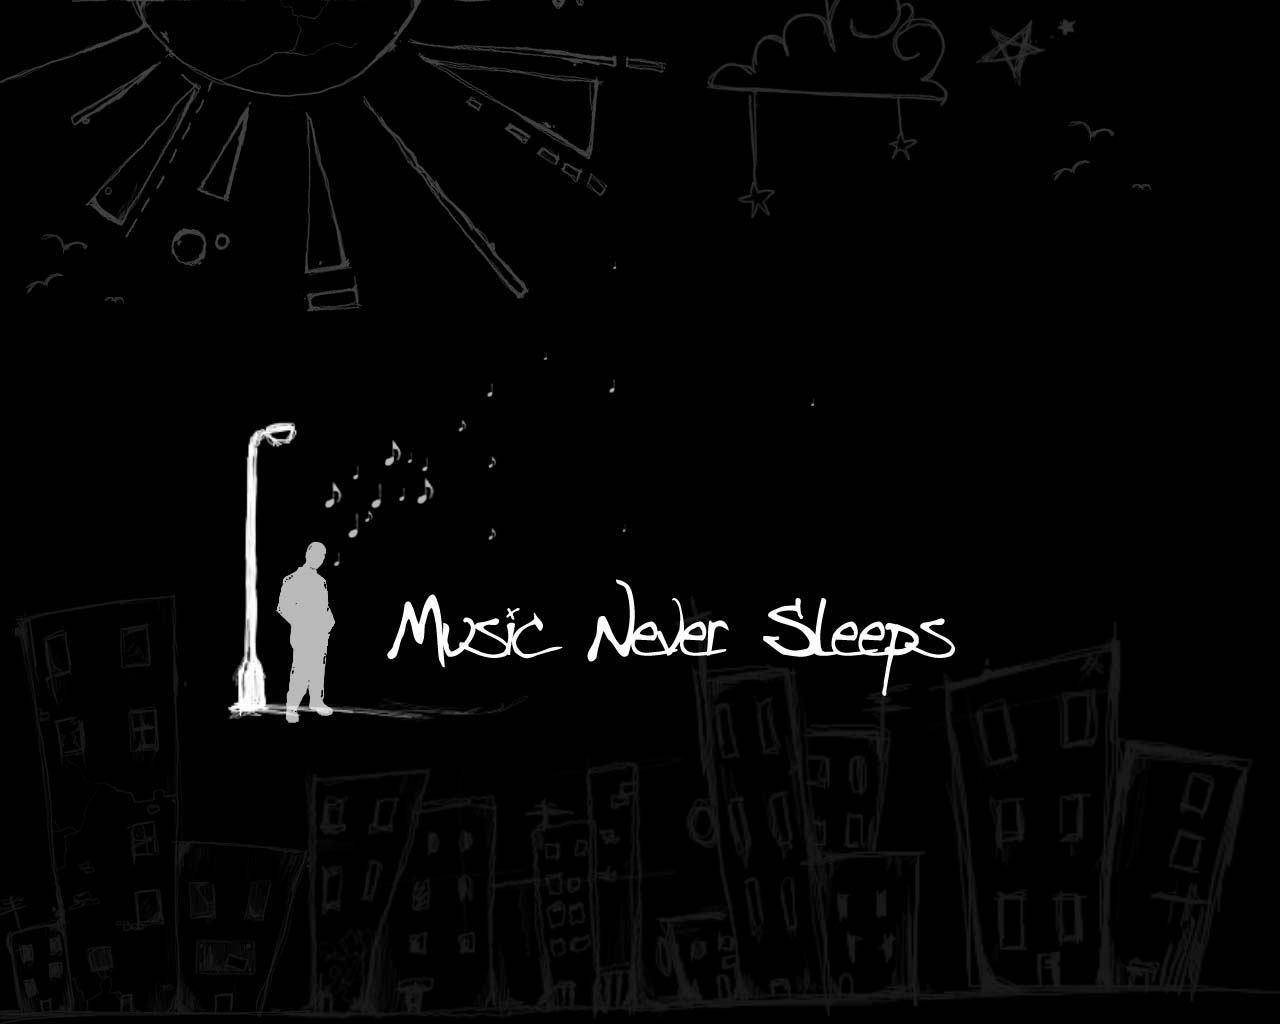 âm nhạc never sleeps